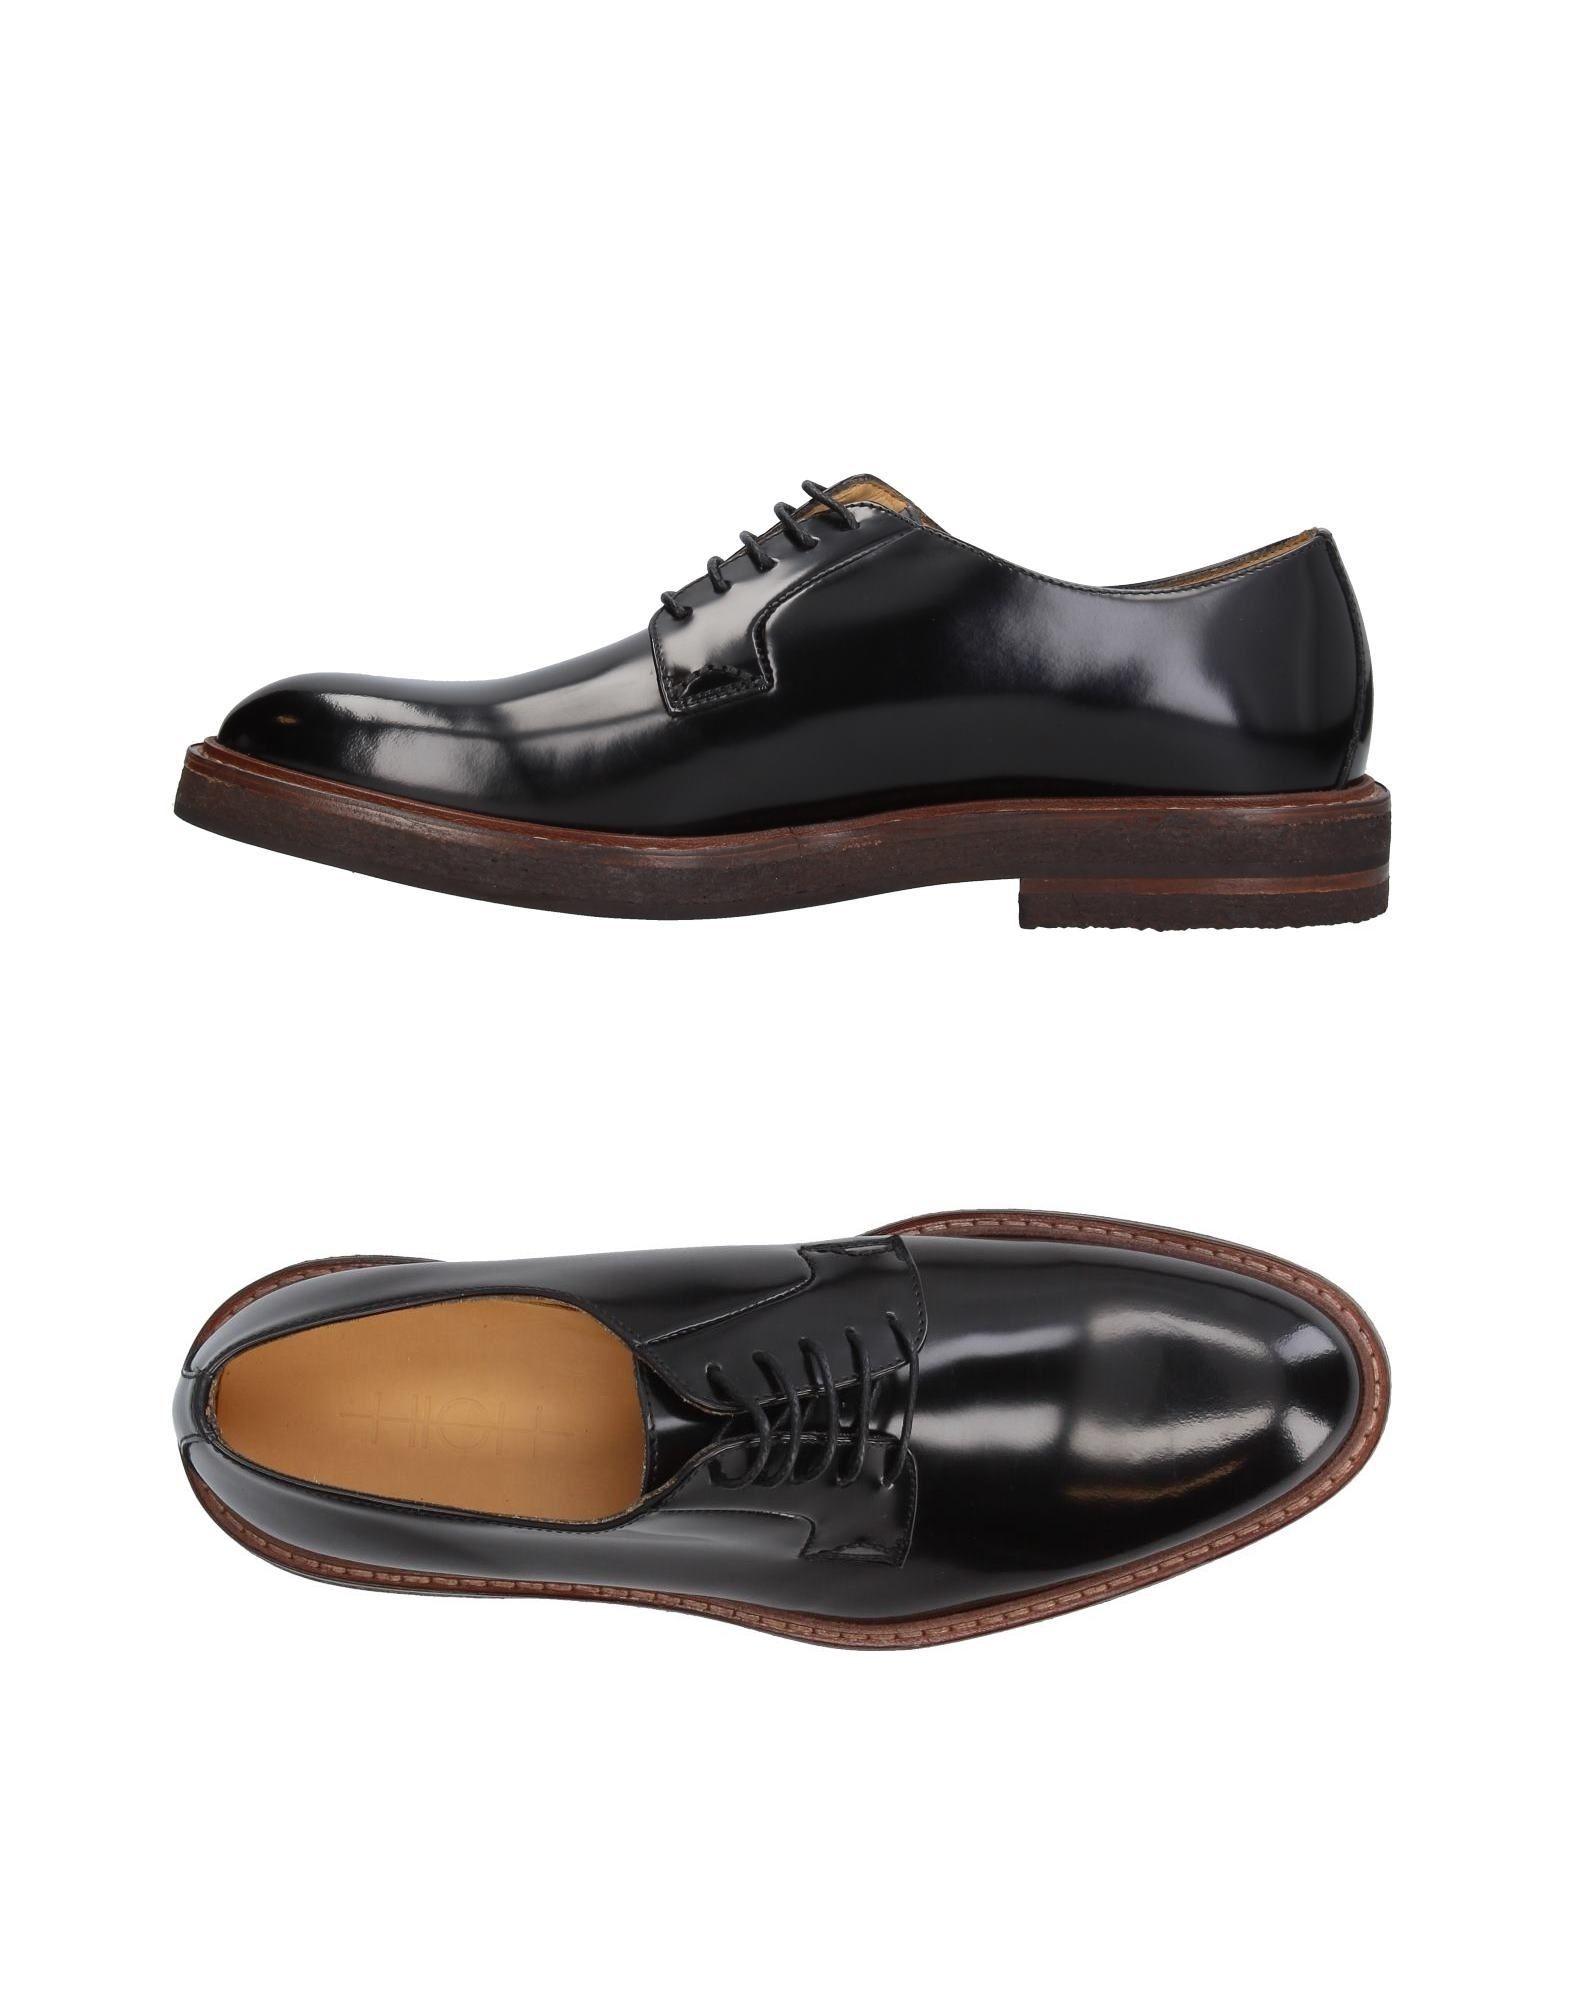 High Schnürschuhe Herren  11397500DK Gute Qualität beliebte Schuhe